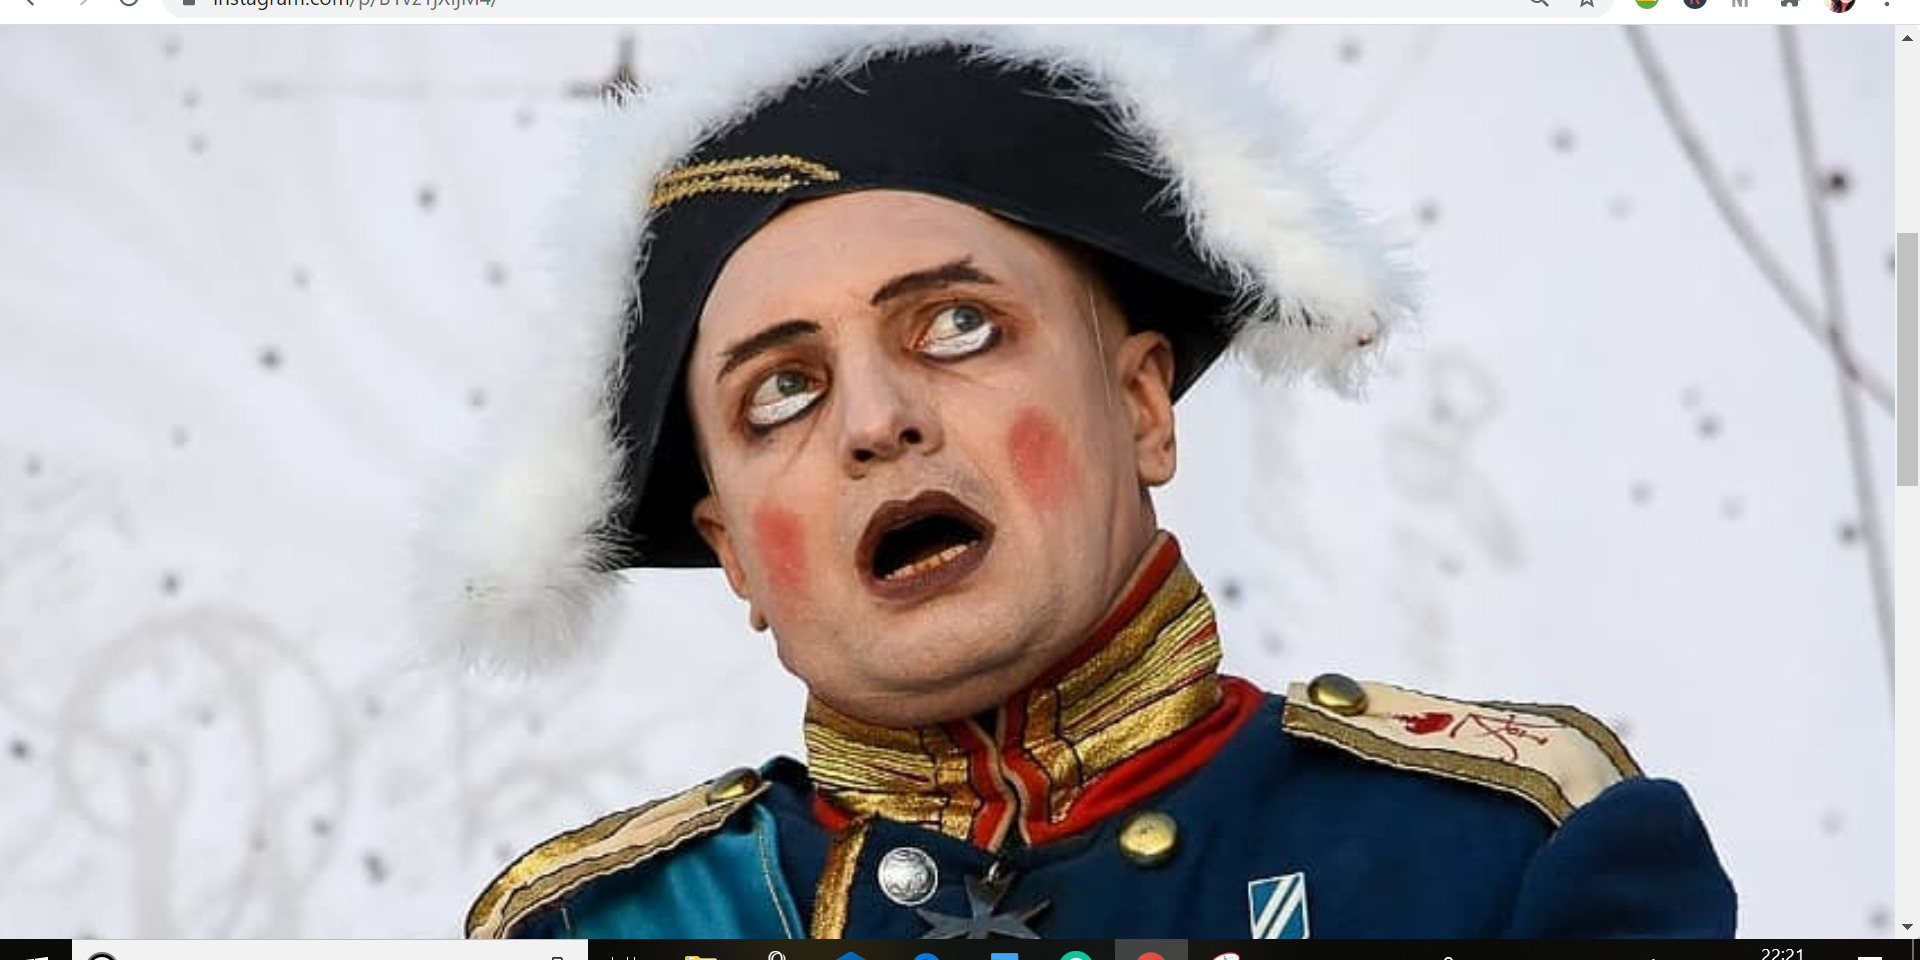 Vadim Savenkov America's Got Talent